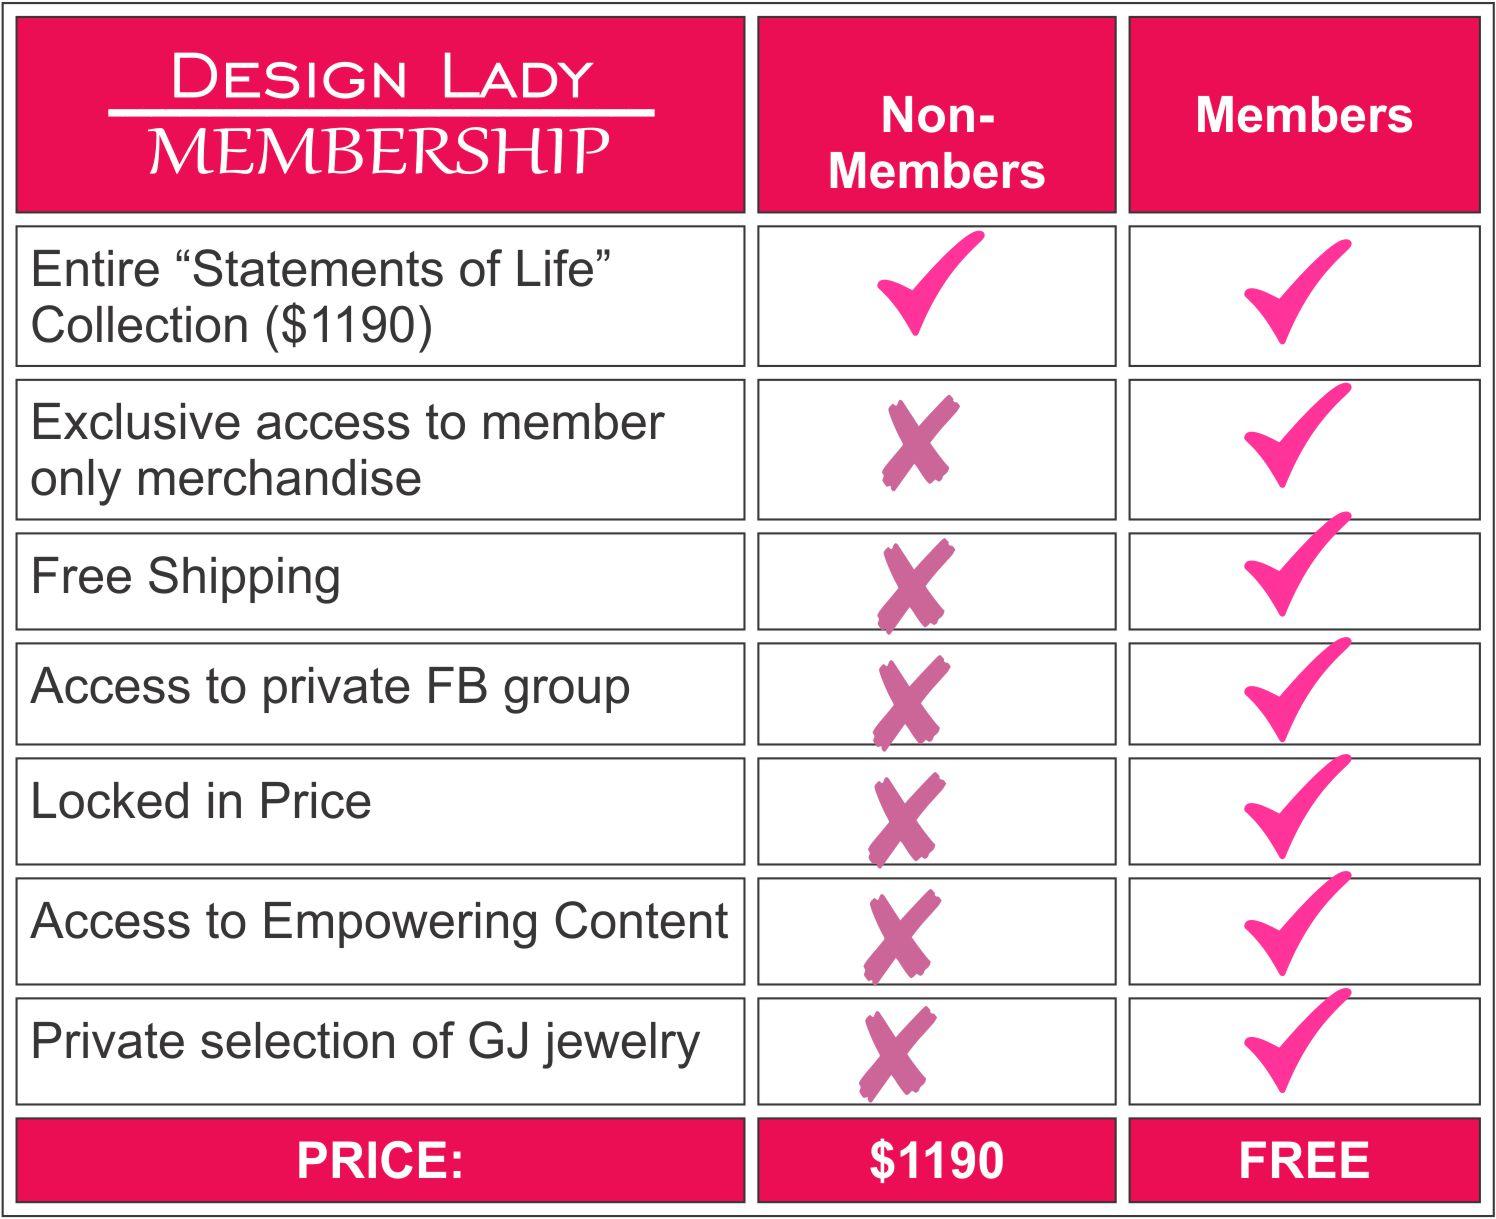 Design Lady Membership benefits 2